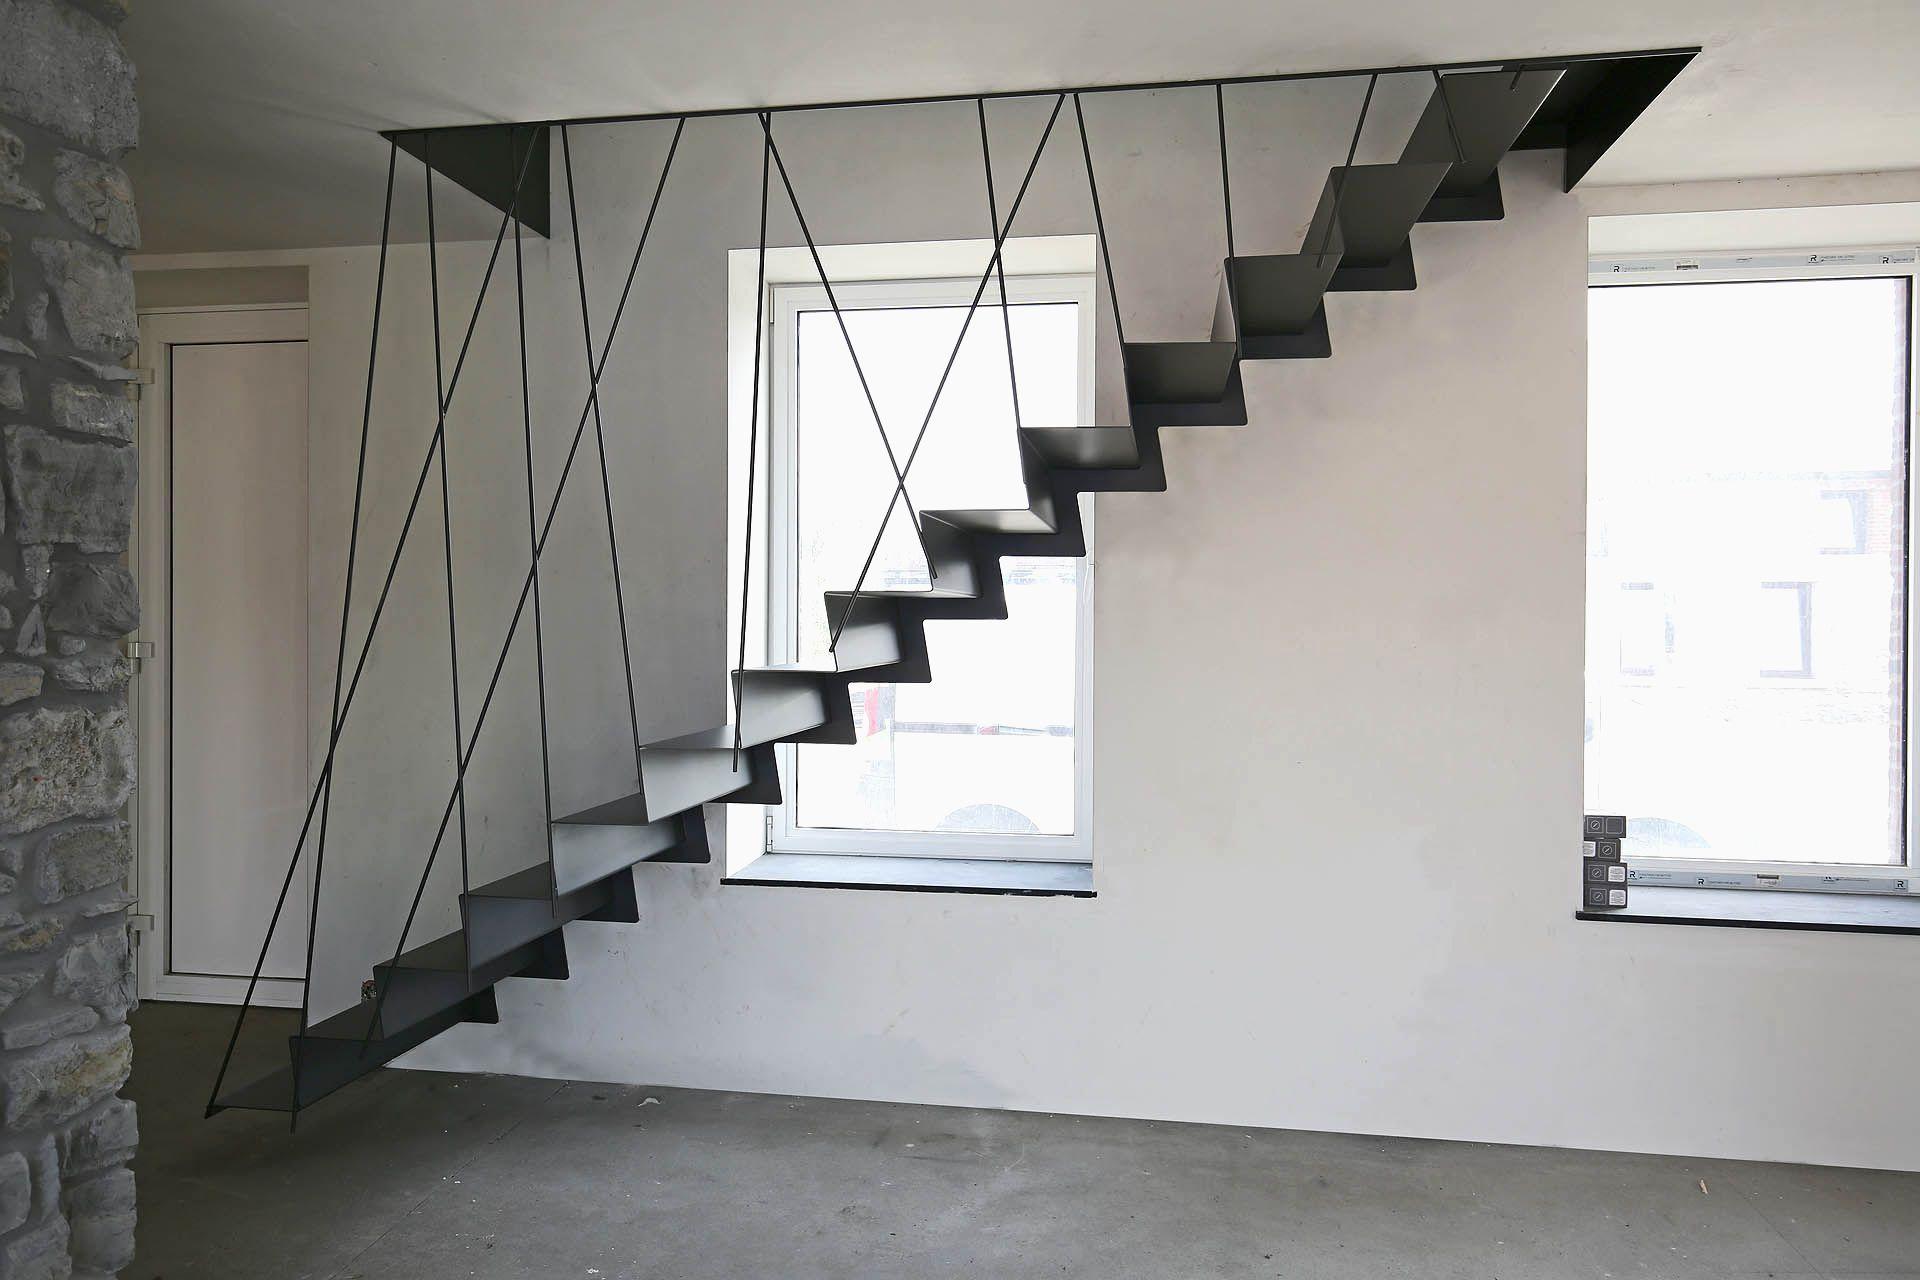 Extrêmement Rampe Escalier Corde Leroy Merlin Unique